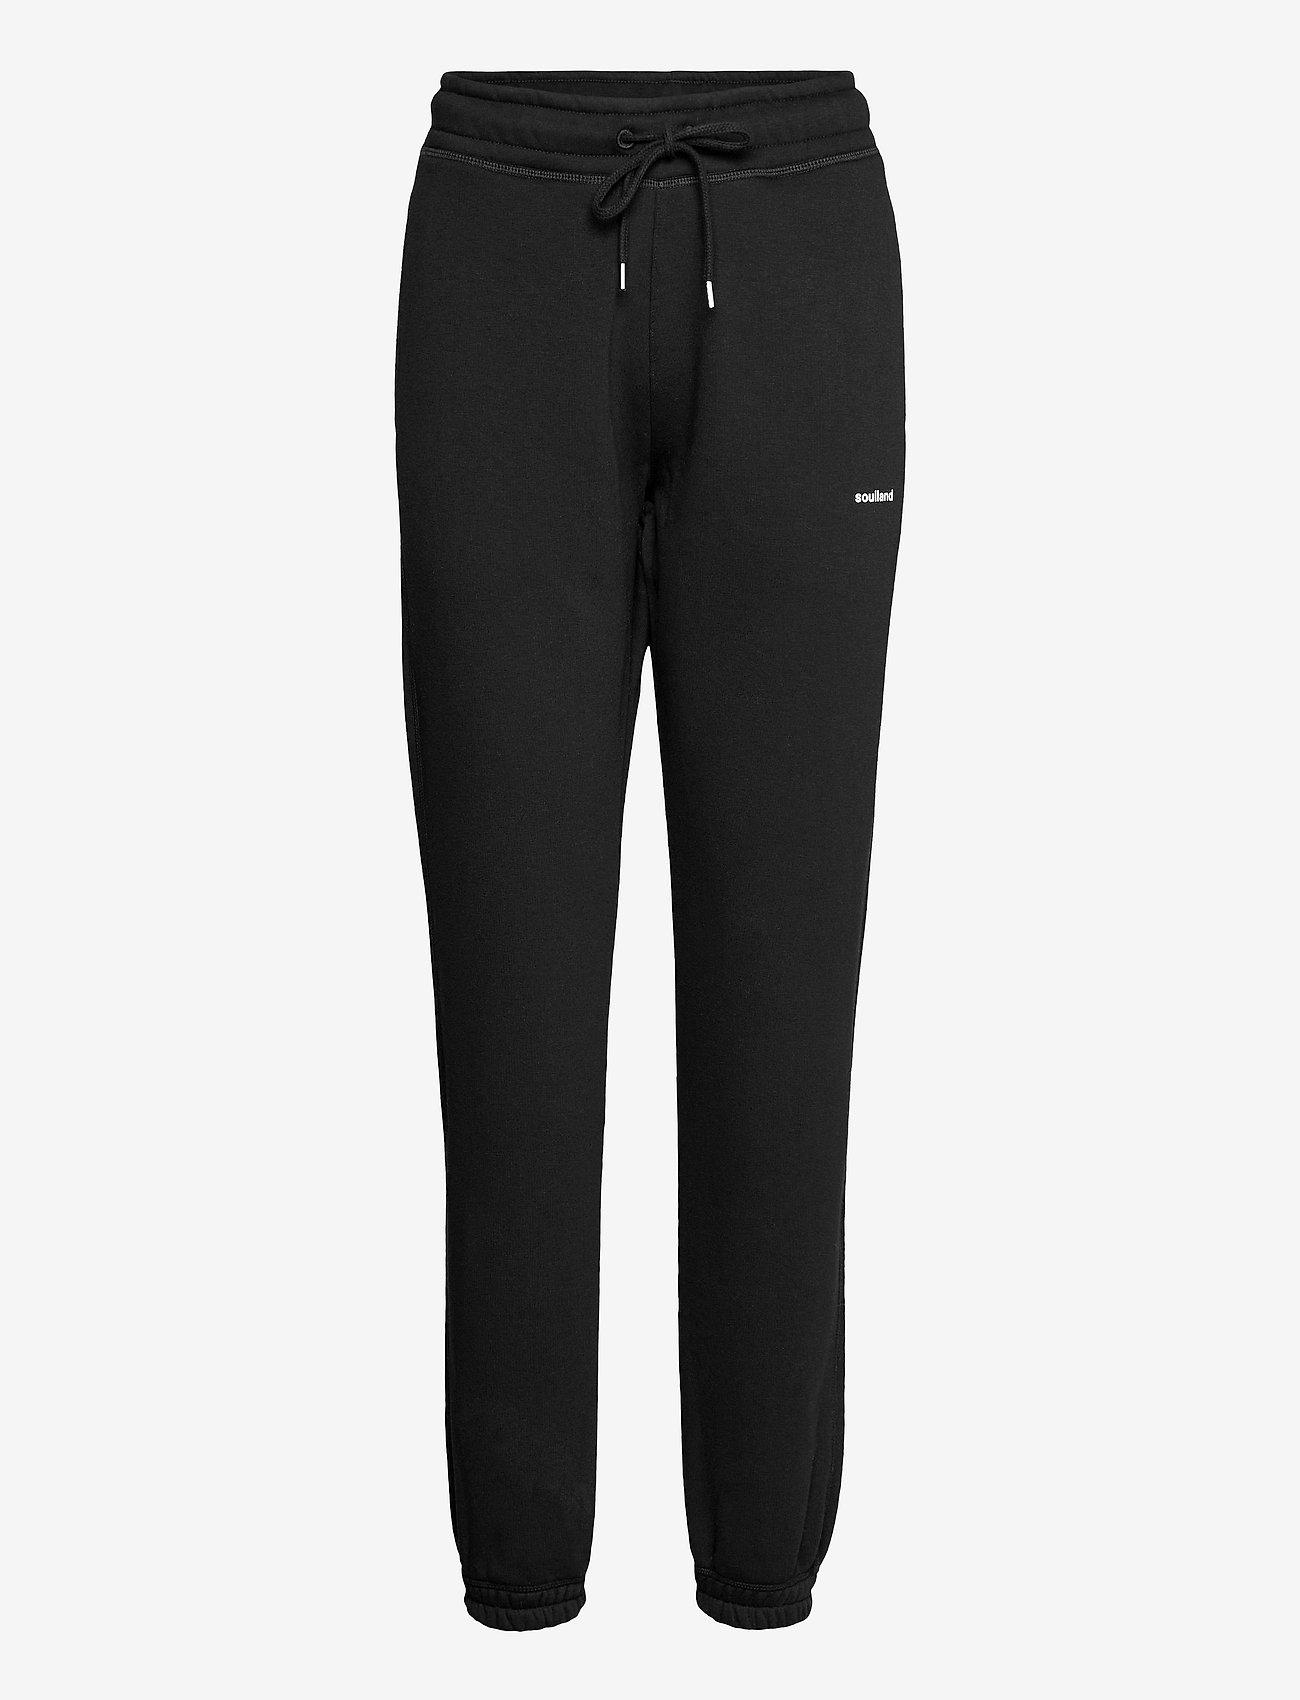 Soulland - Eisa pants - kleidung - black - 0